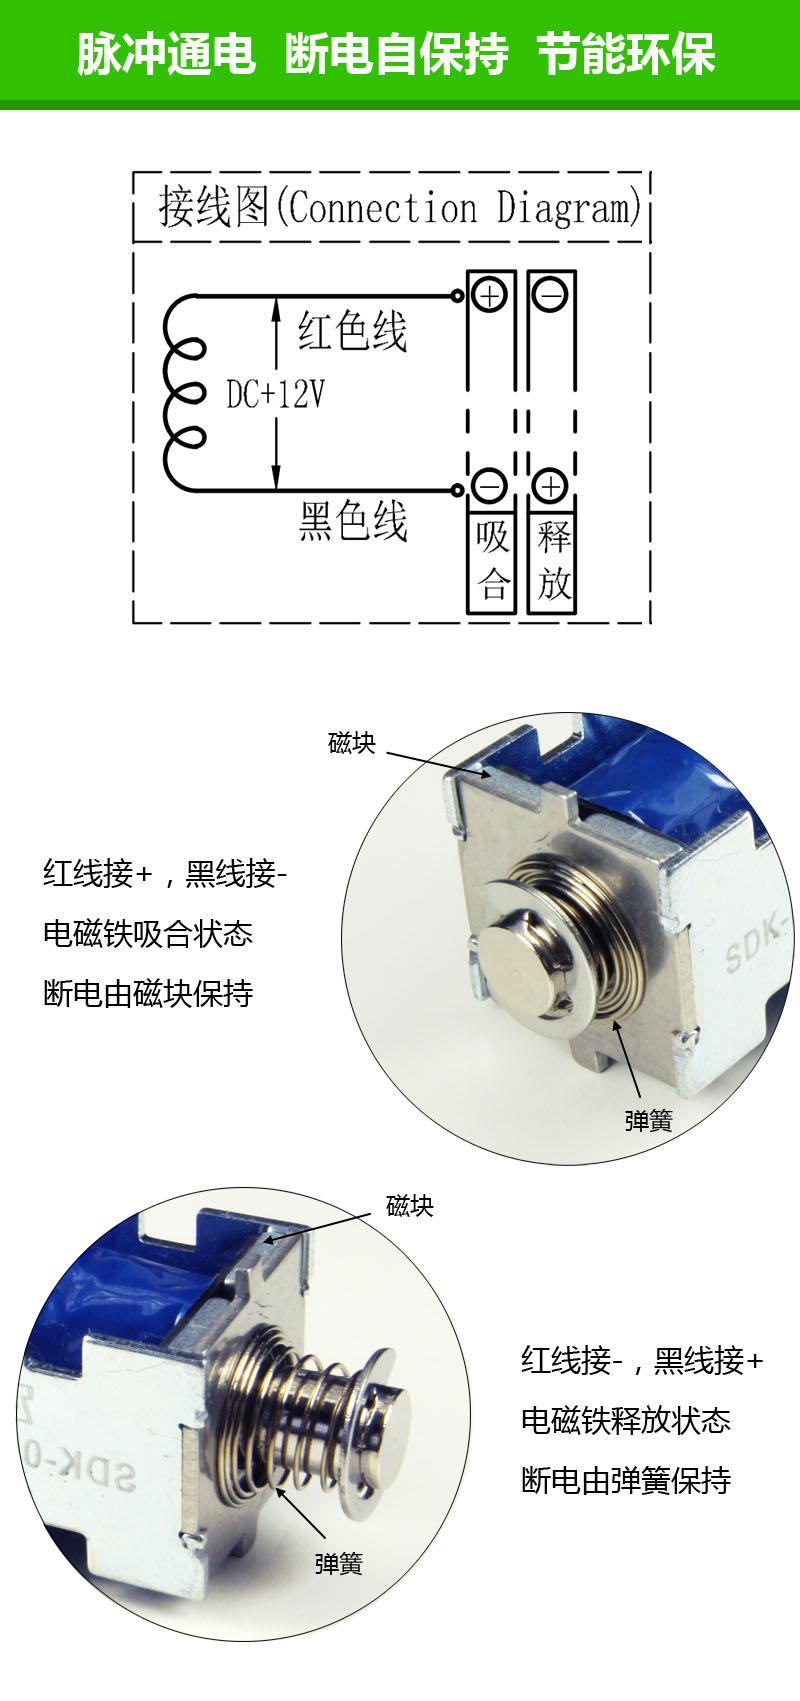 SDK-0633S单保持电磁铁 酒店房门刷卡系统安全电子锁自保持推拉电磁铁